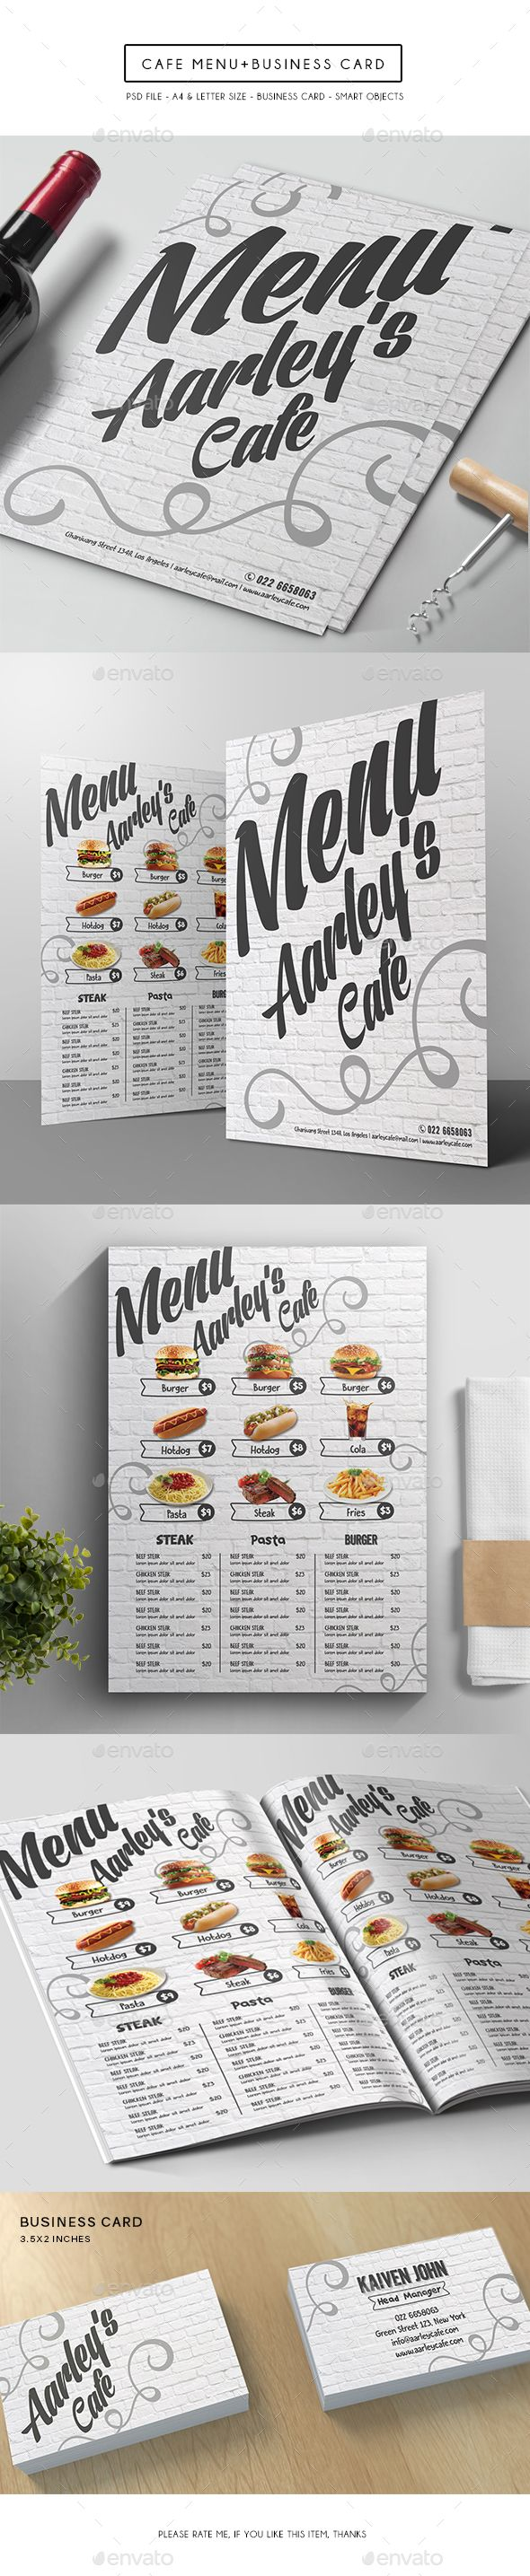 Cafe Menu + Business Card - Food Menus Print Templates. DOWNLOAD http://graphicriver.net/item/cafe-menu-business-card/15086419?ref=sinzo